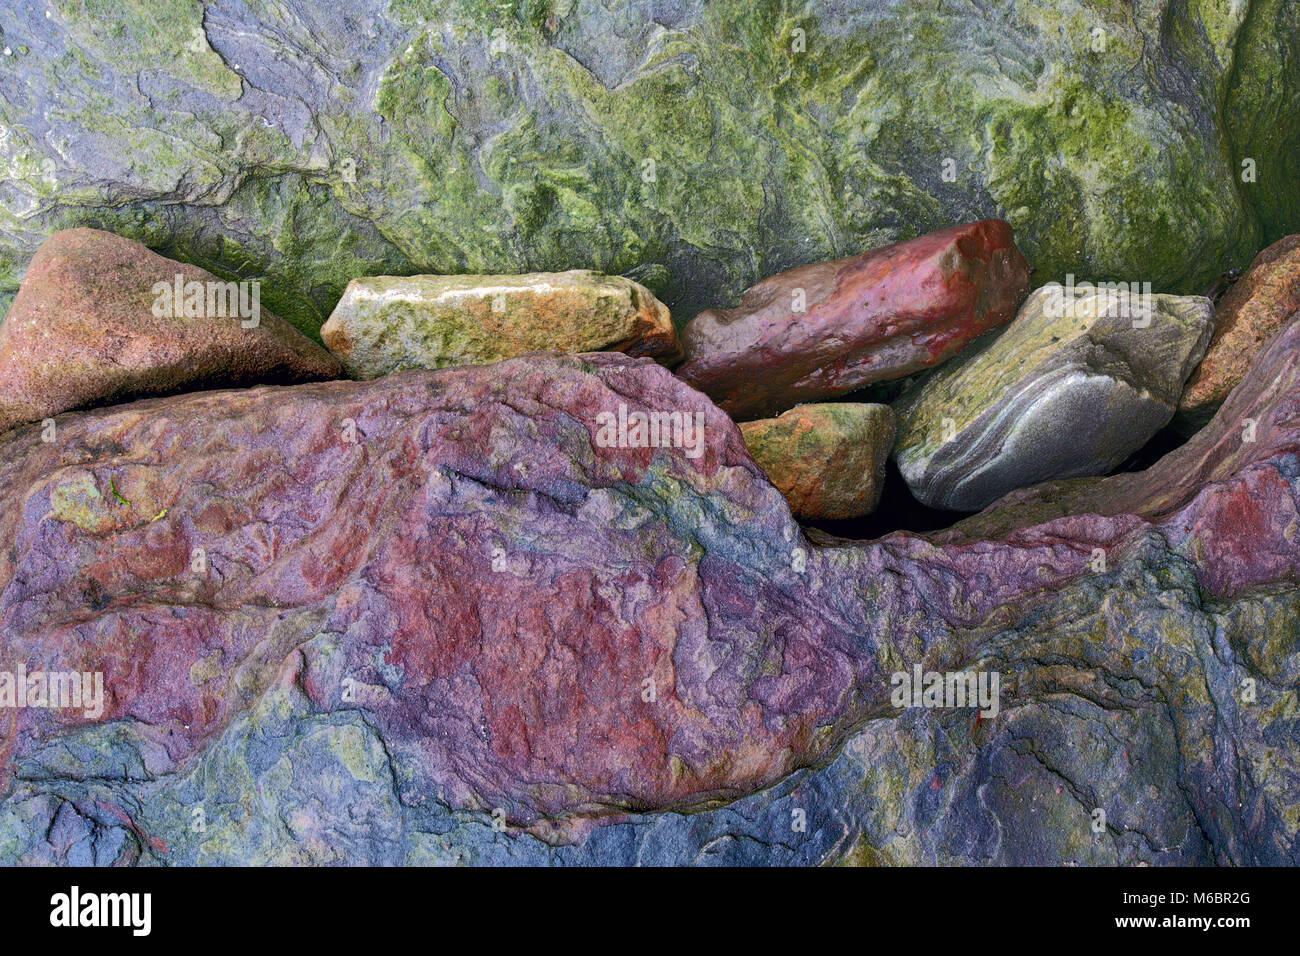 A close up view of colorful rocks on St Aidan's beach along the Northumberland coast near Bamburgh, England,UK - Stock Image